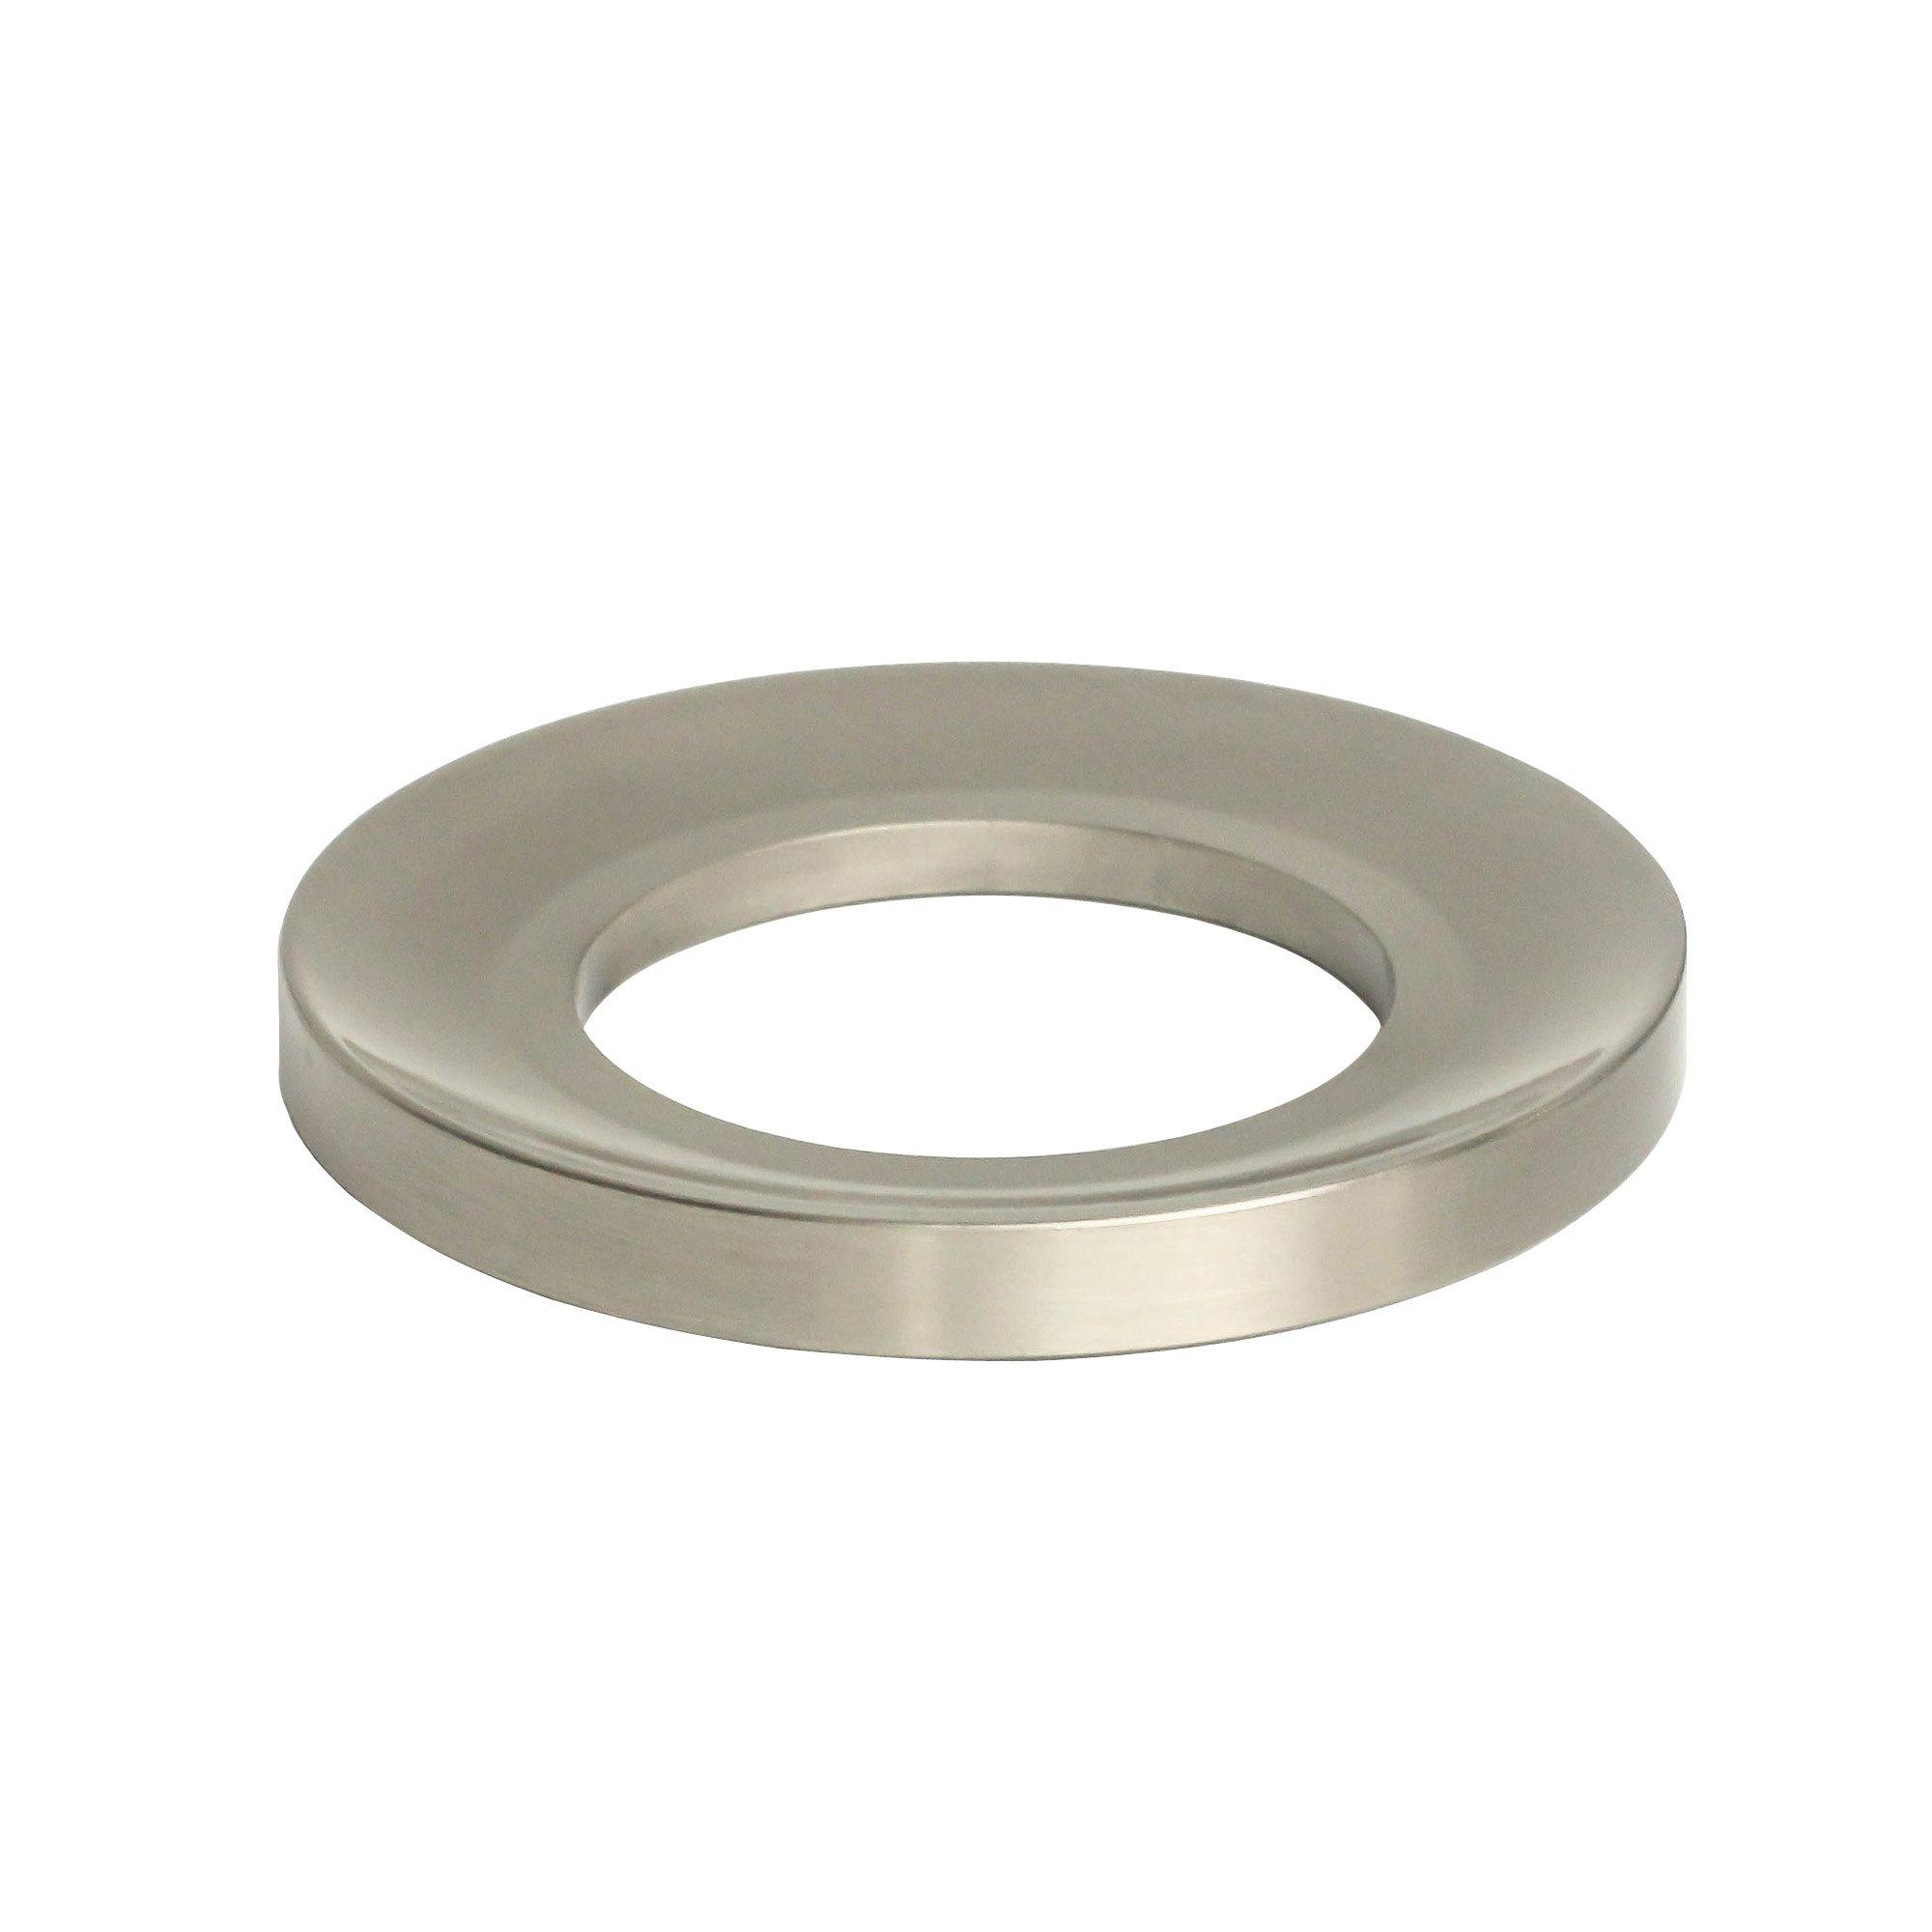 MYHB MLAN1701BR Lead Free Solid Brass Bathroom Vessel Sink Mounting Ring, Brushed Nickel